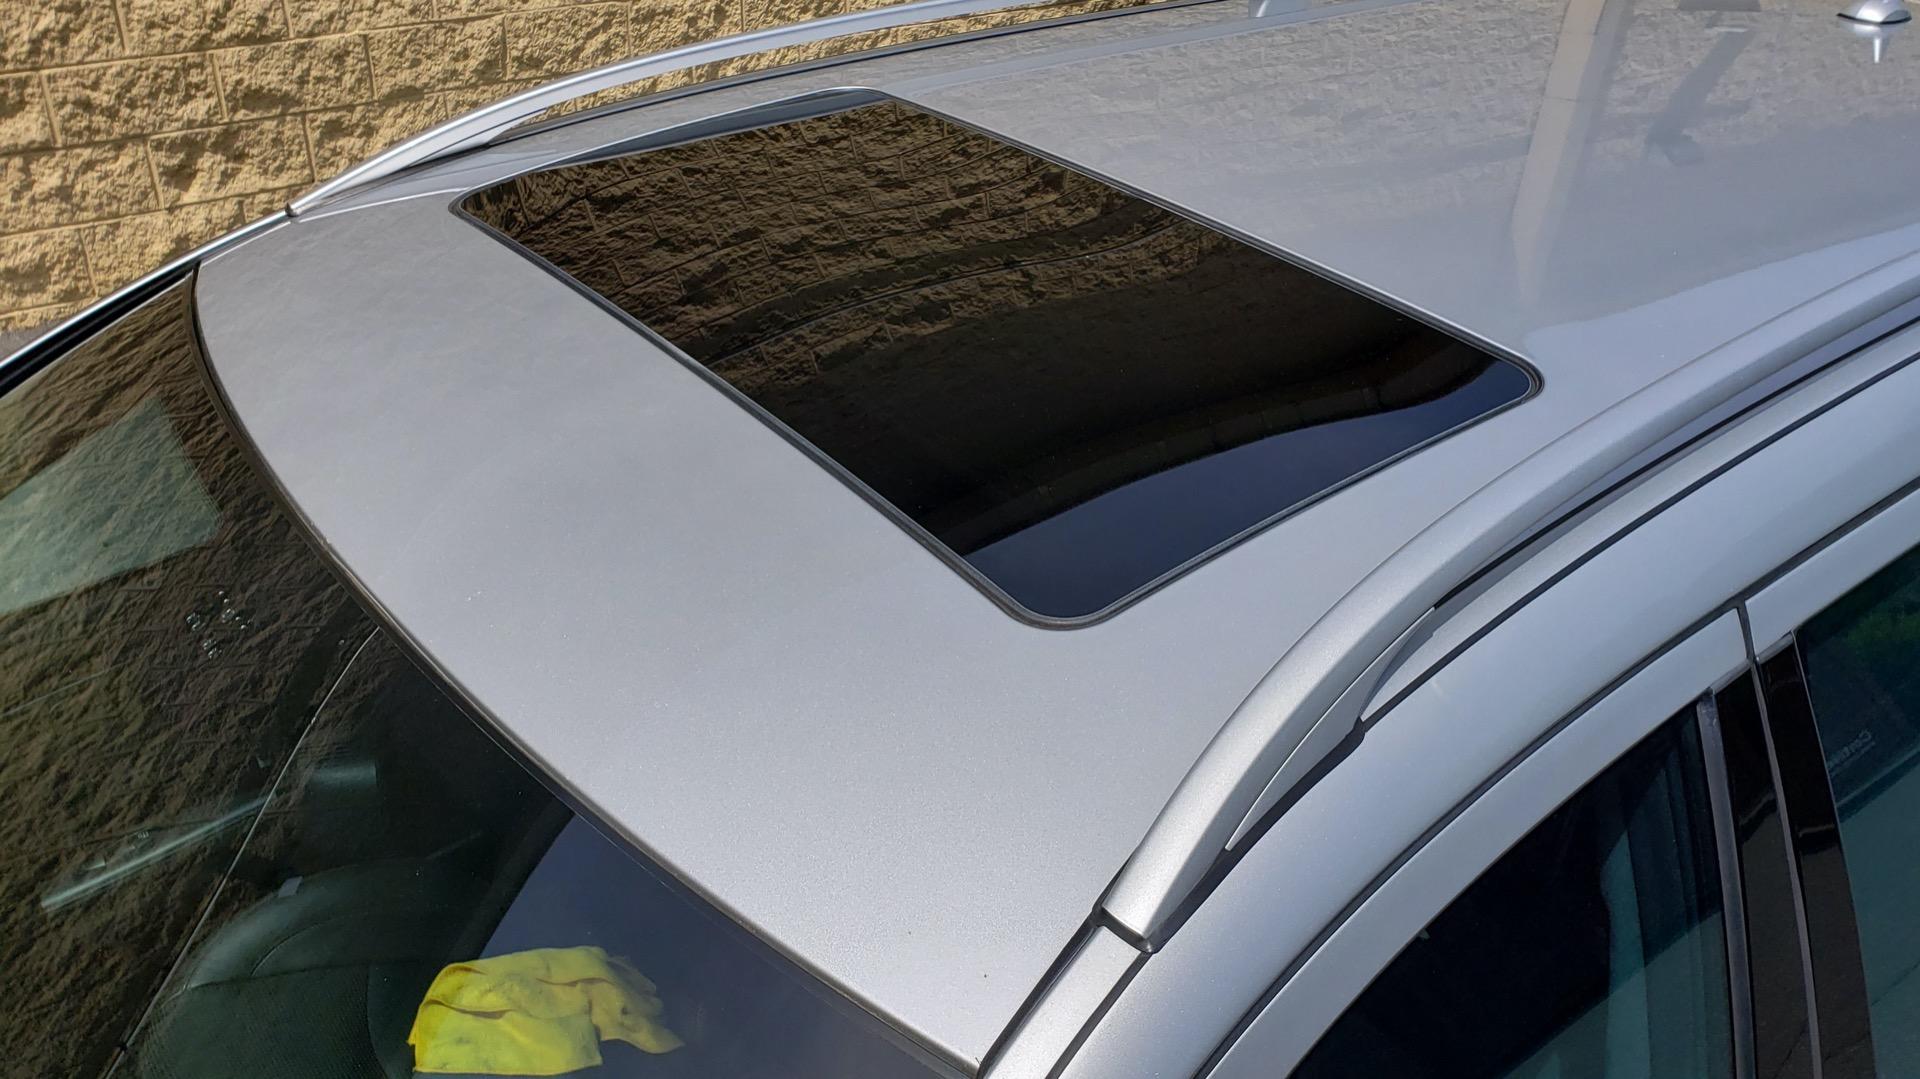 Used 2007 Mercedes-Benz E-Class E63 AMG WAGON / NAV / SUNROOF / HARMAN/KARDON for sale $29,000 at Formula Imports in Charlotte NC 28227 8